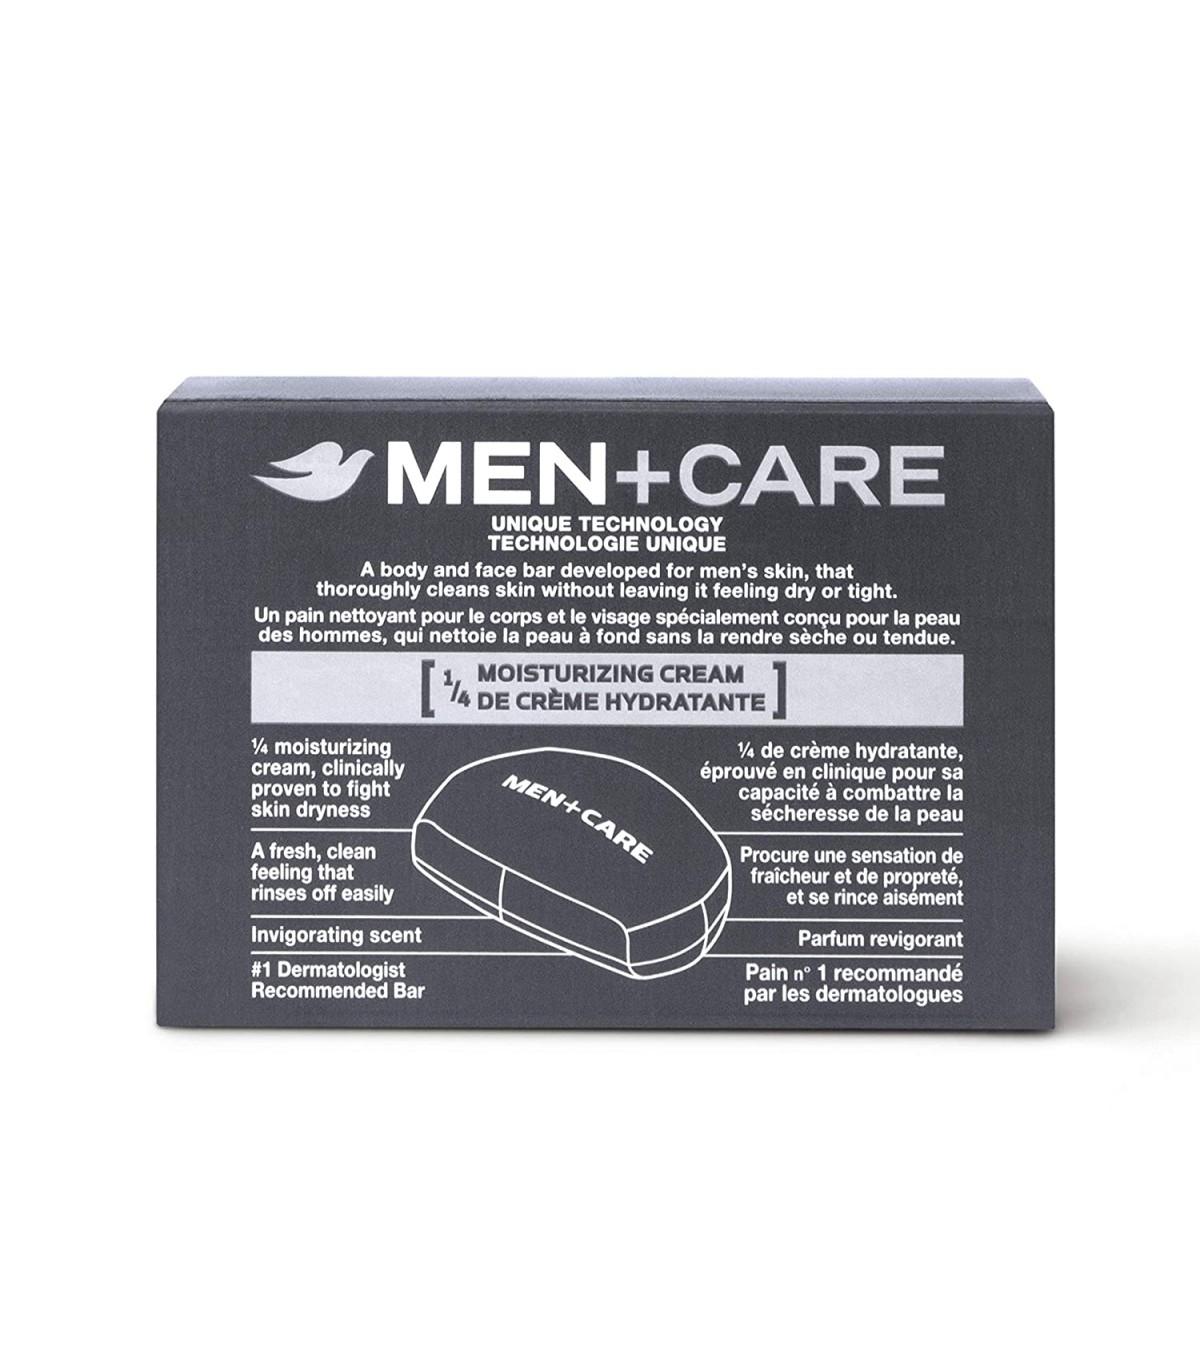 Dove پک 4 عددی صابون مراقبت مردانه اکسترا فرش 100 گرمی داو